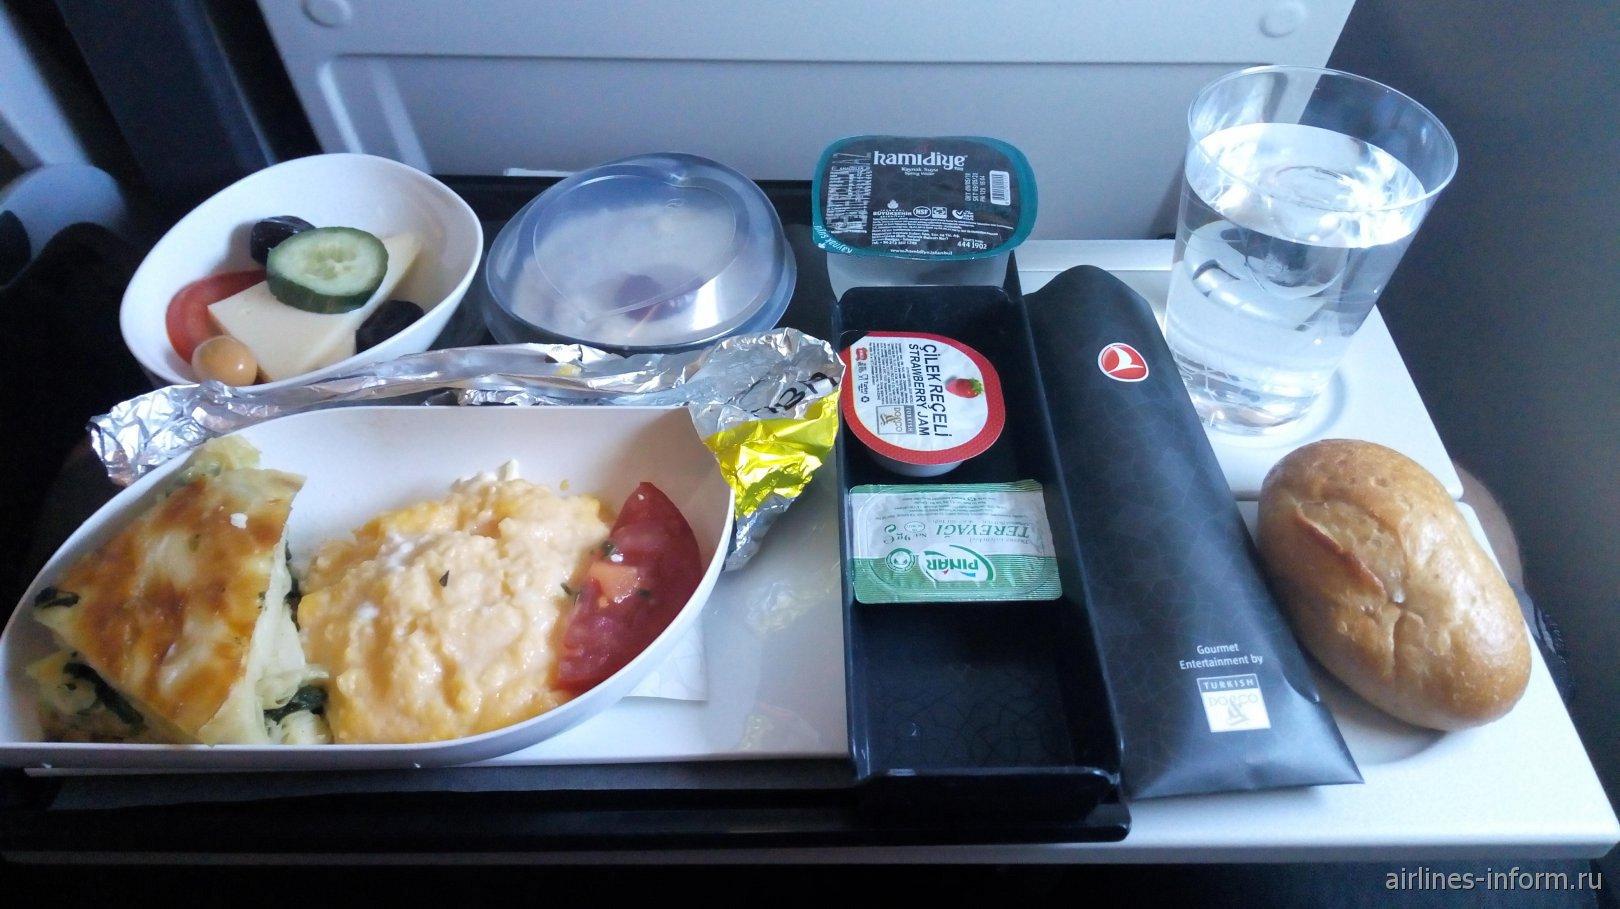 Завтрак на рейсе Стамбул-Бангкок Турецких авиалиний